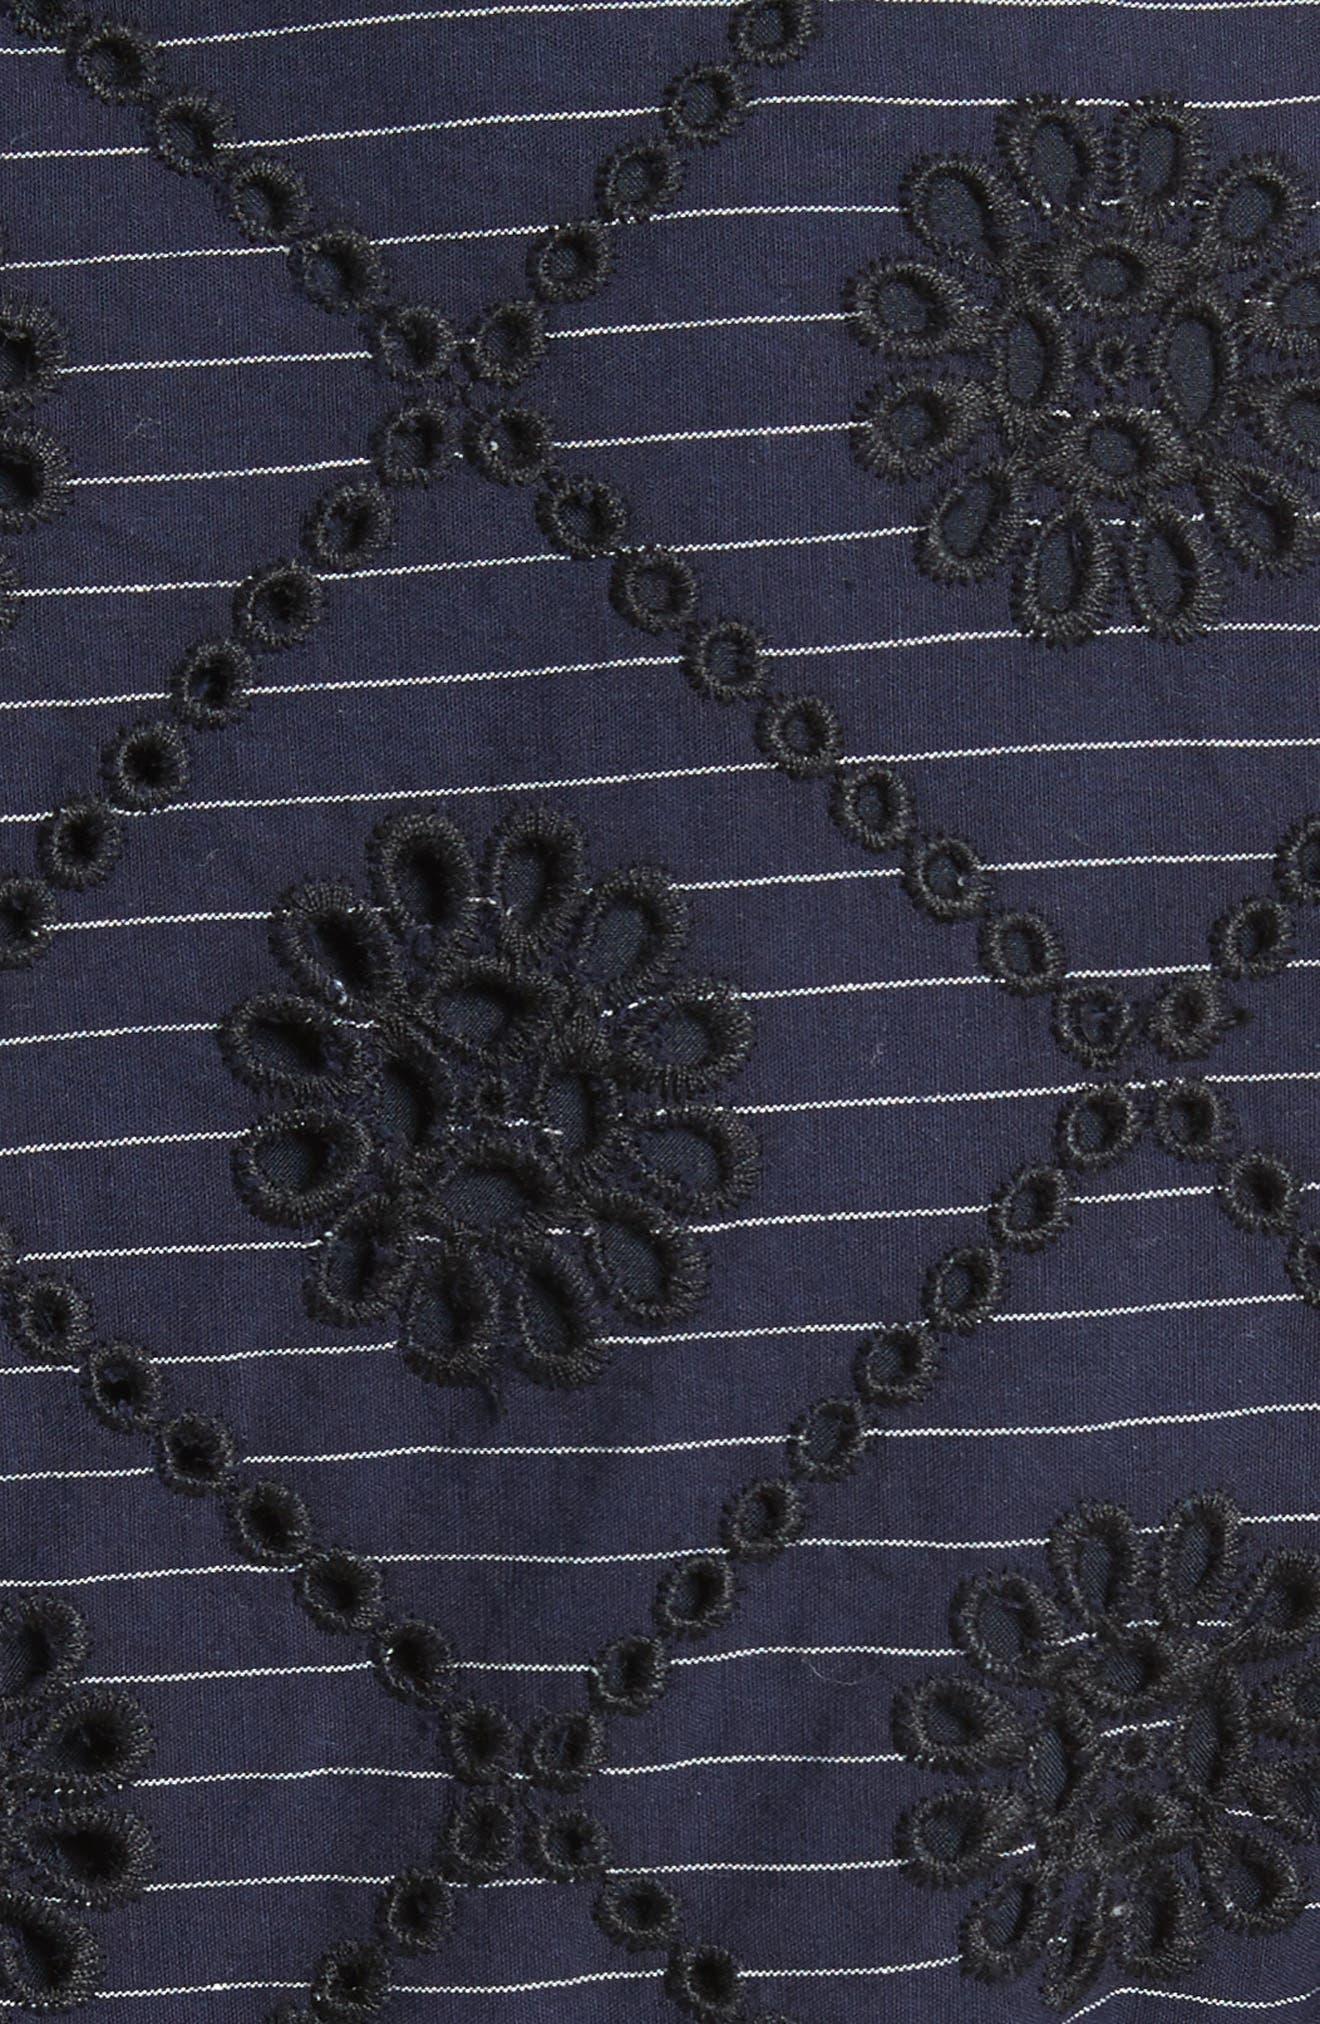 Ruffle Sleeve Eyelet Minidress,                             Alternate thumbnail 5, color,                             Navy Pin Strip